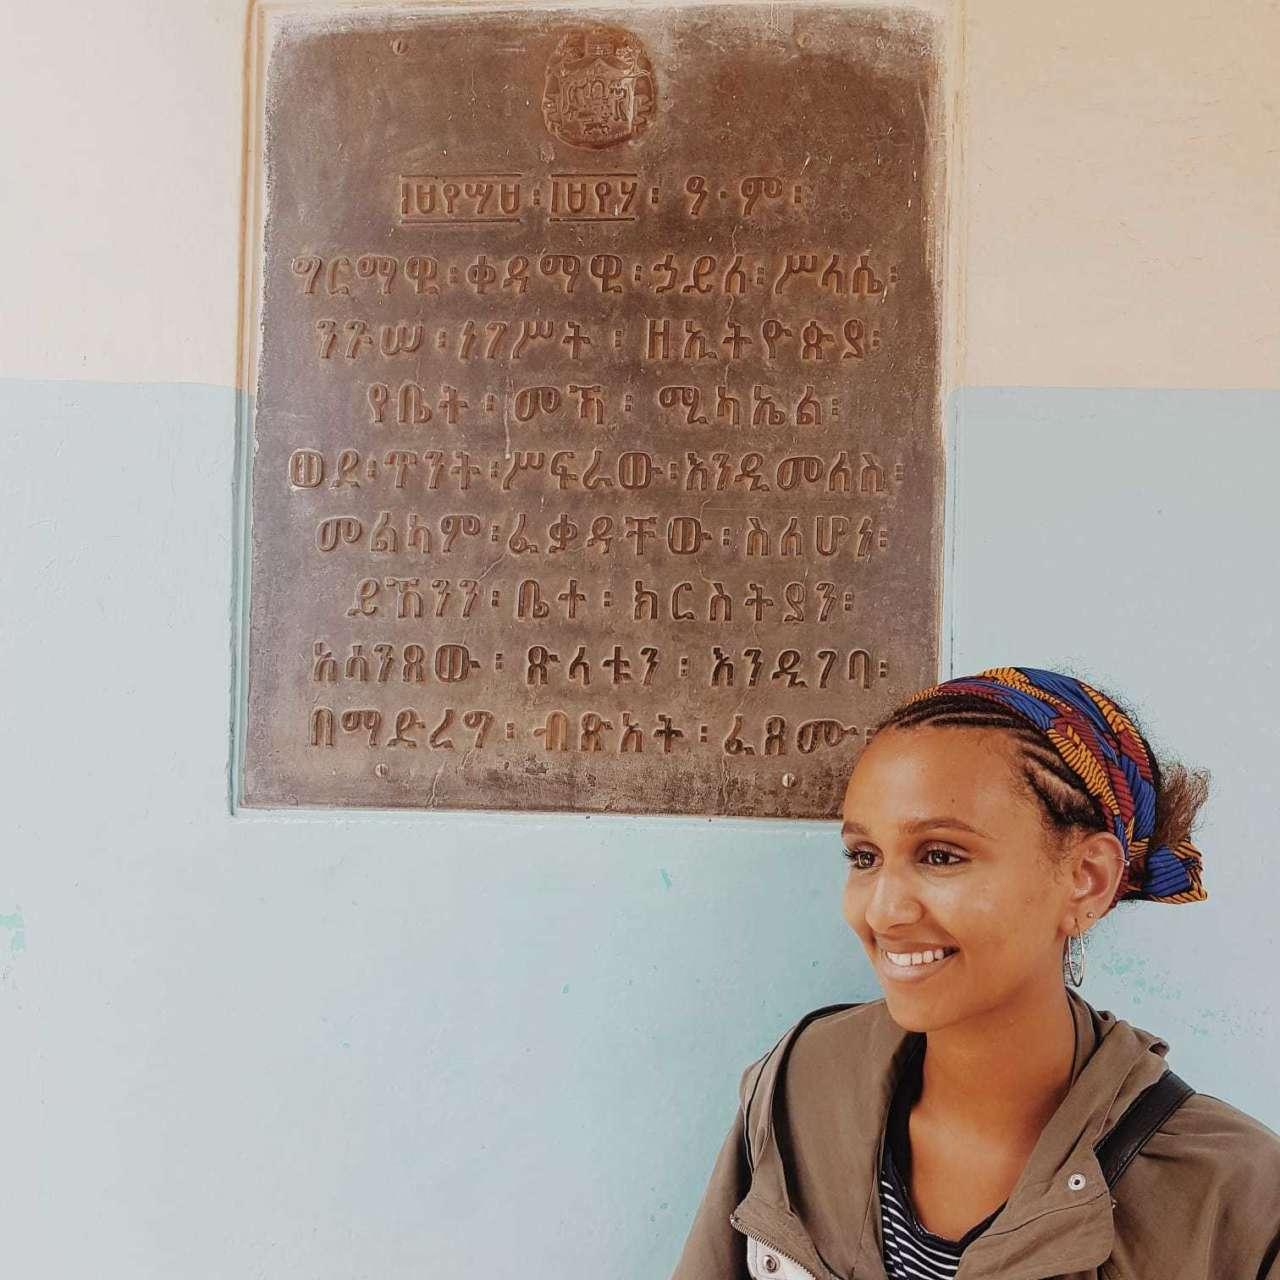 Adventures in Eritrea